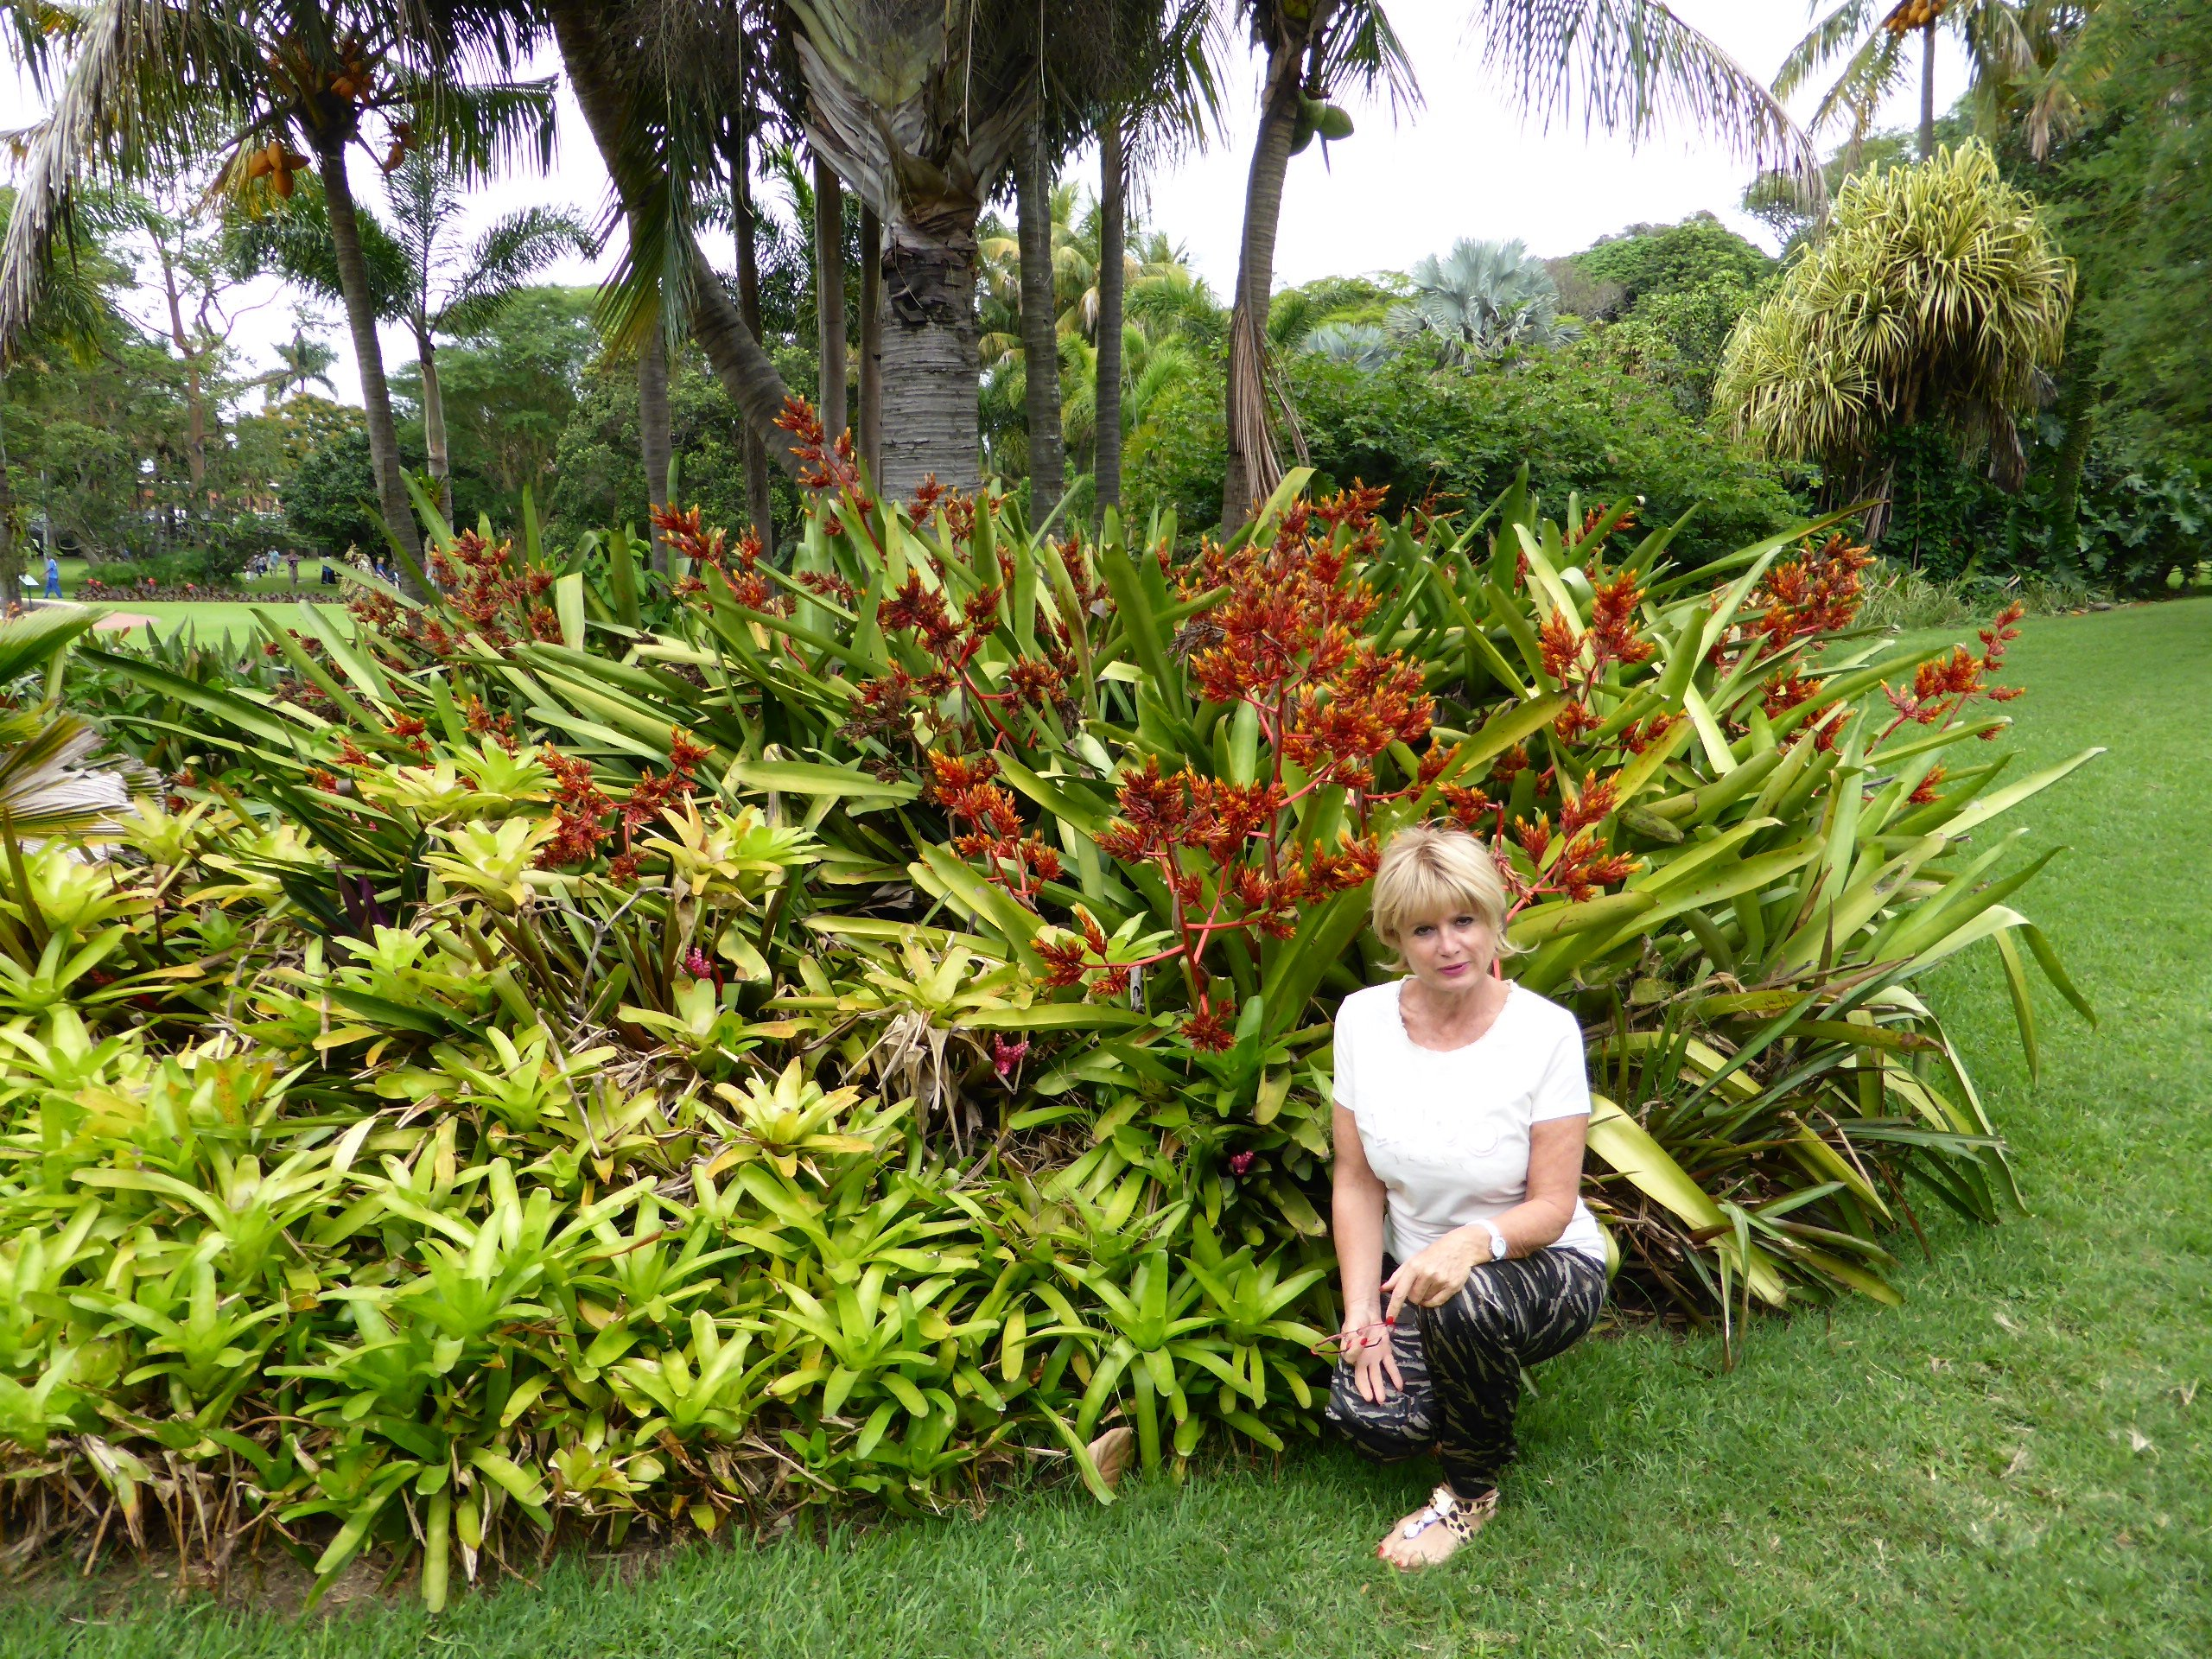 Durban 7 avril 2015 mielicharme for Jardin botanique noel 2015